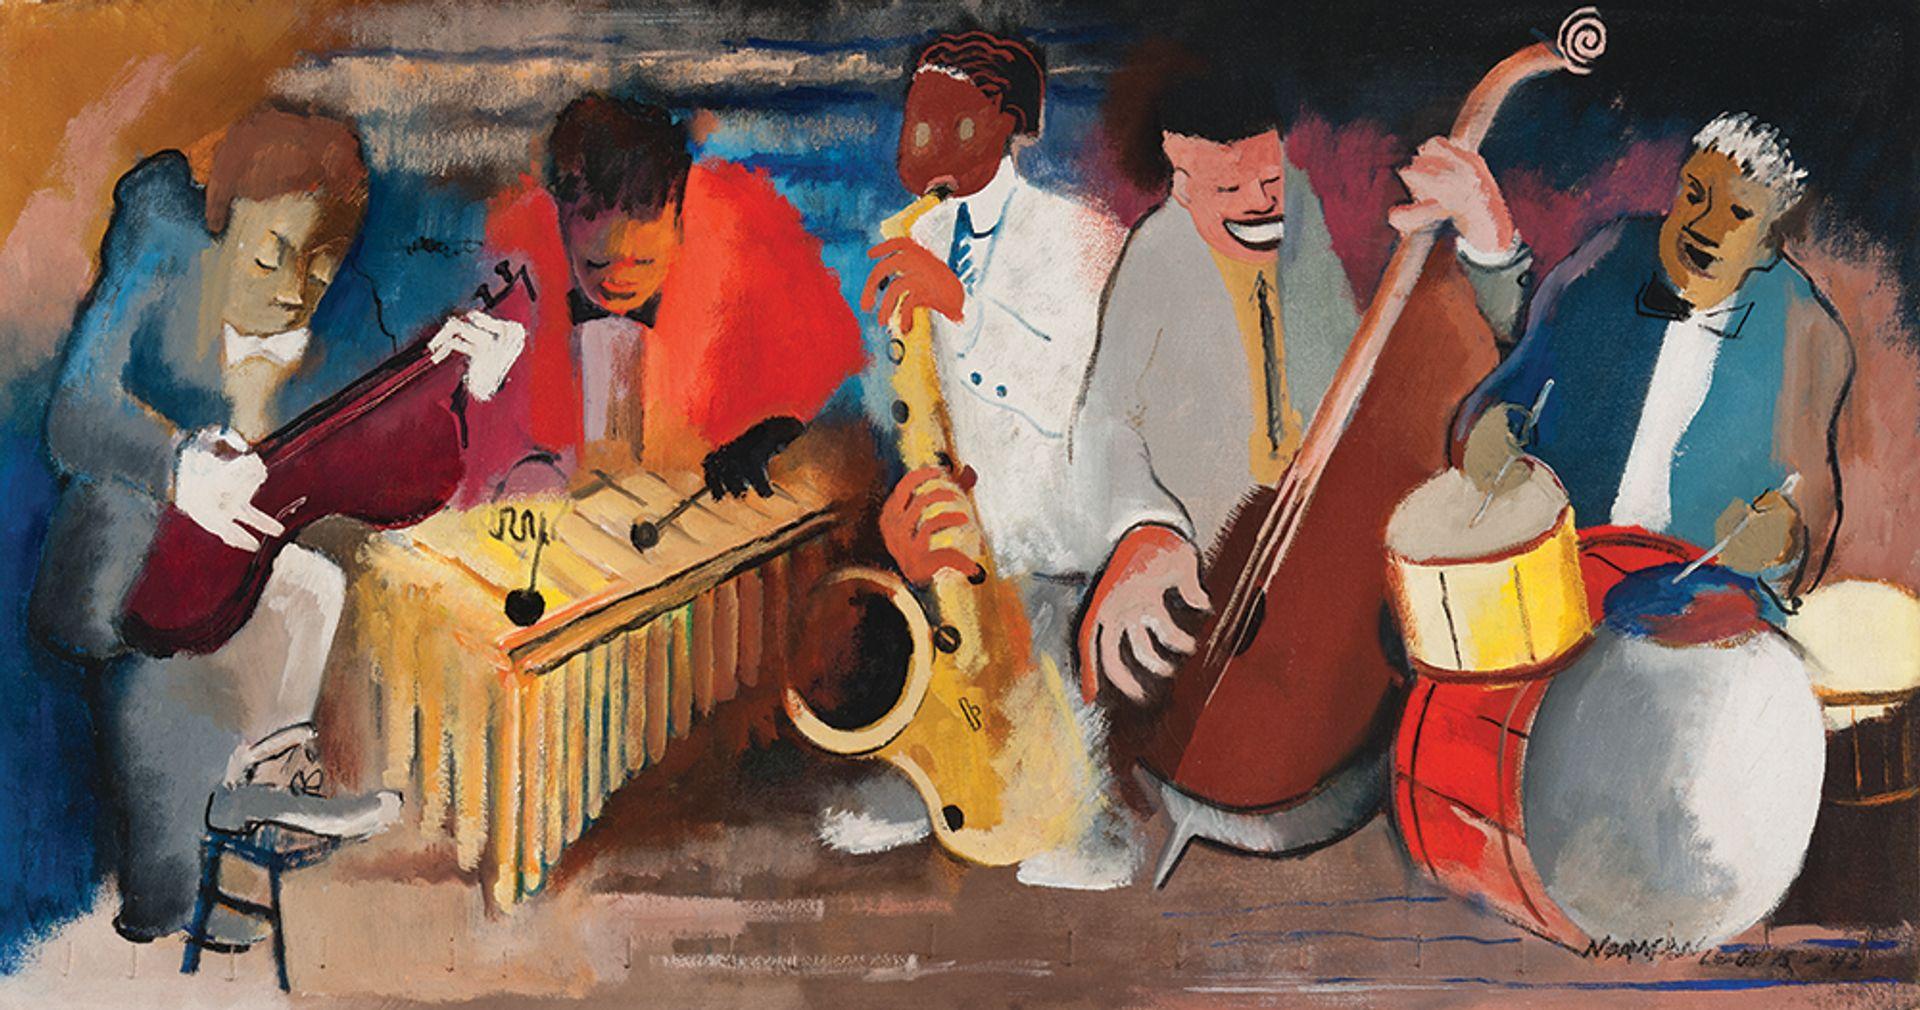 Norman Lewis, Jumping Jive (1942) Michael Rosenfeld Gallery, New York